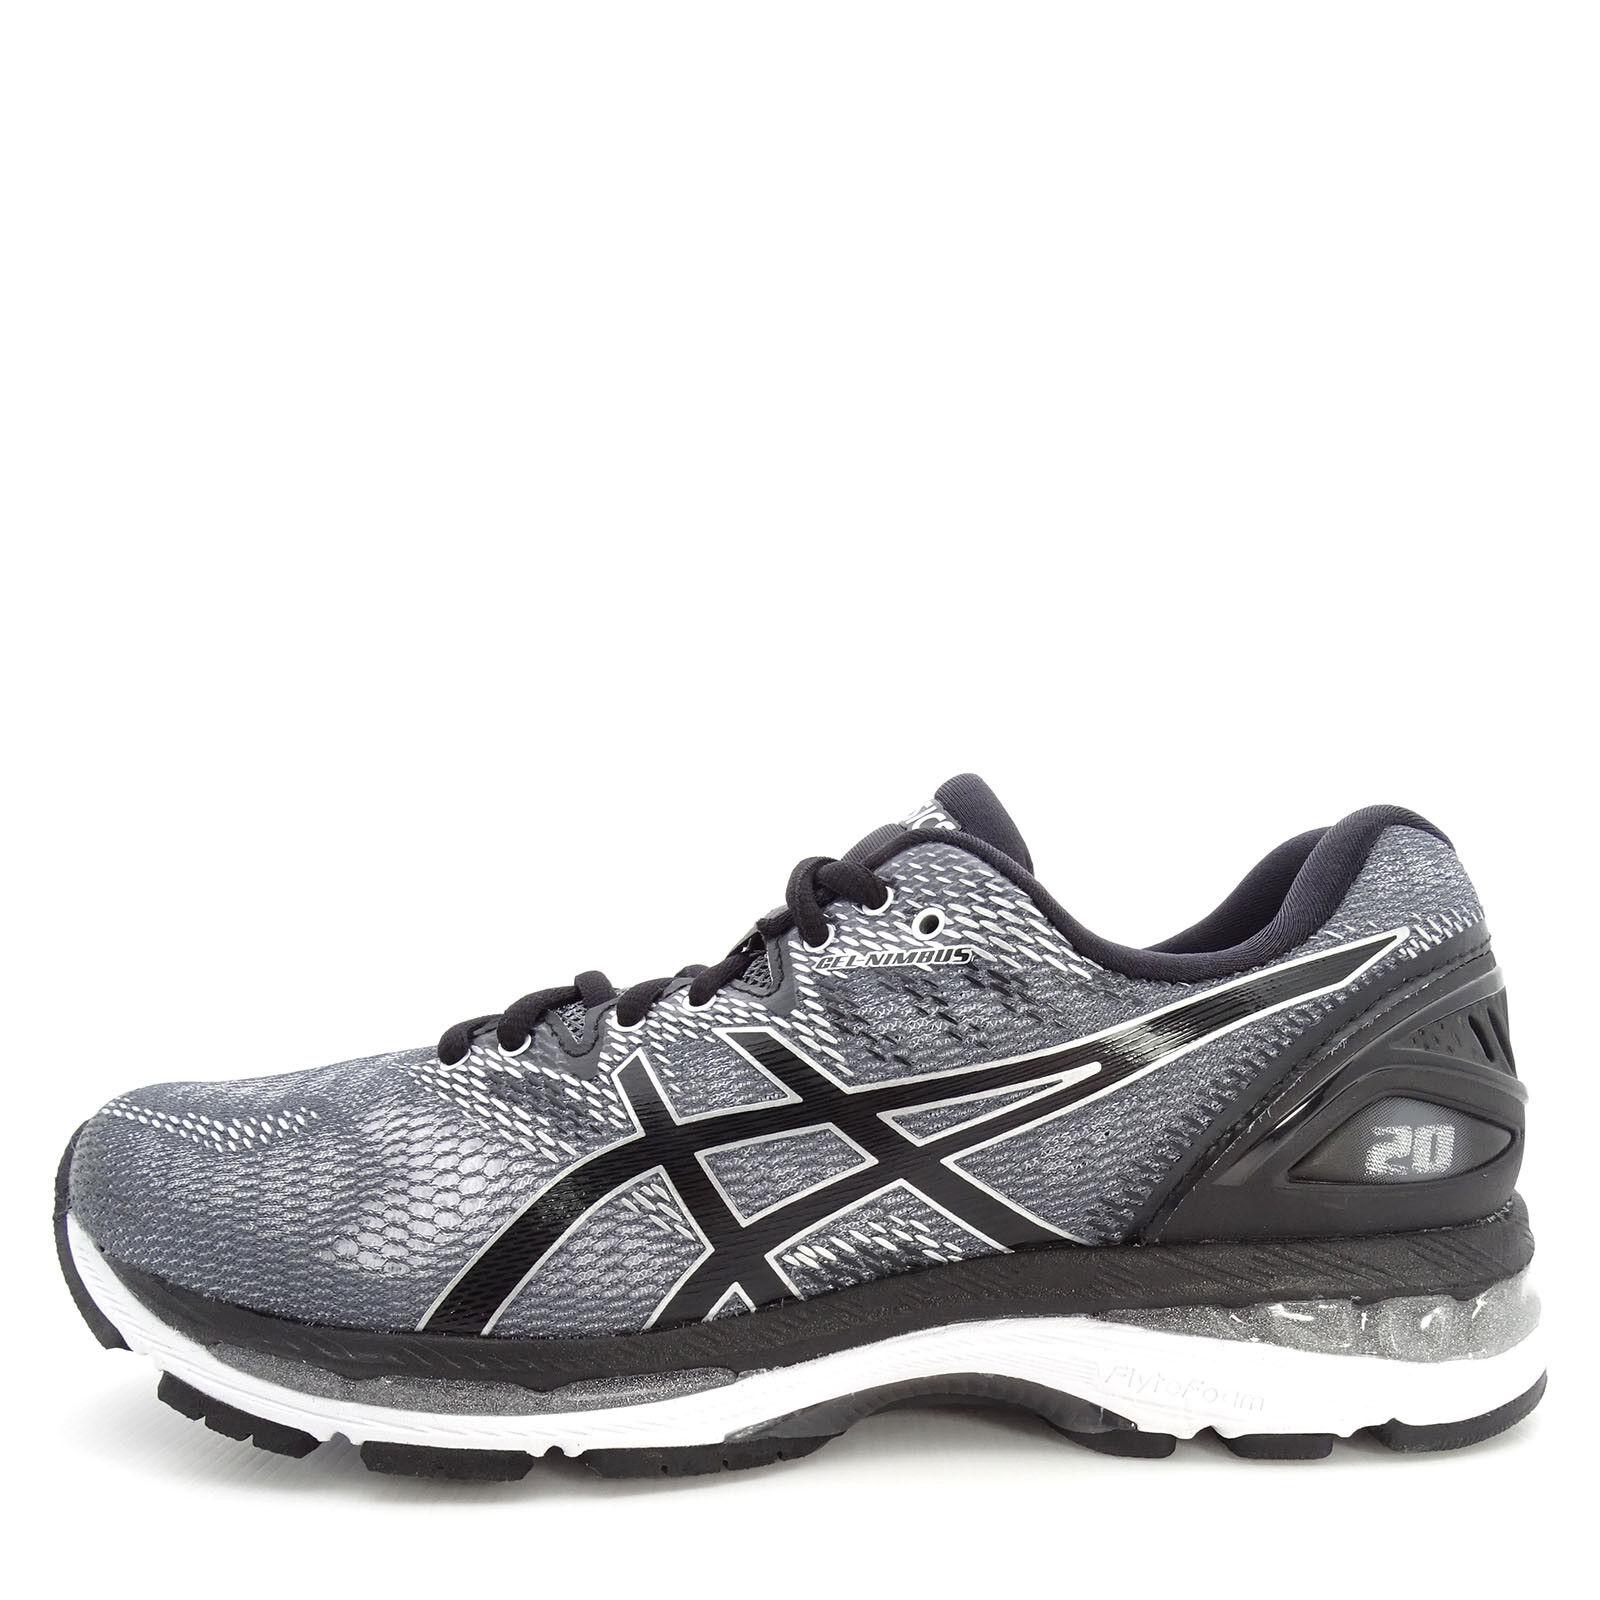 Asics GEL-Nimbus 20 [T800N-9790] Men Running Shoes Carbon/Black-Silver